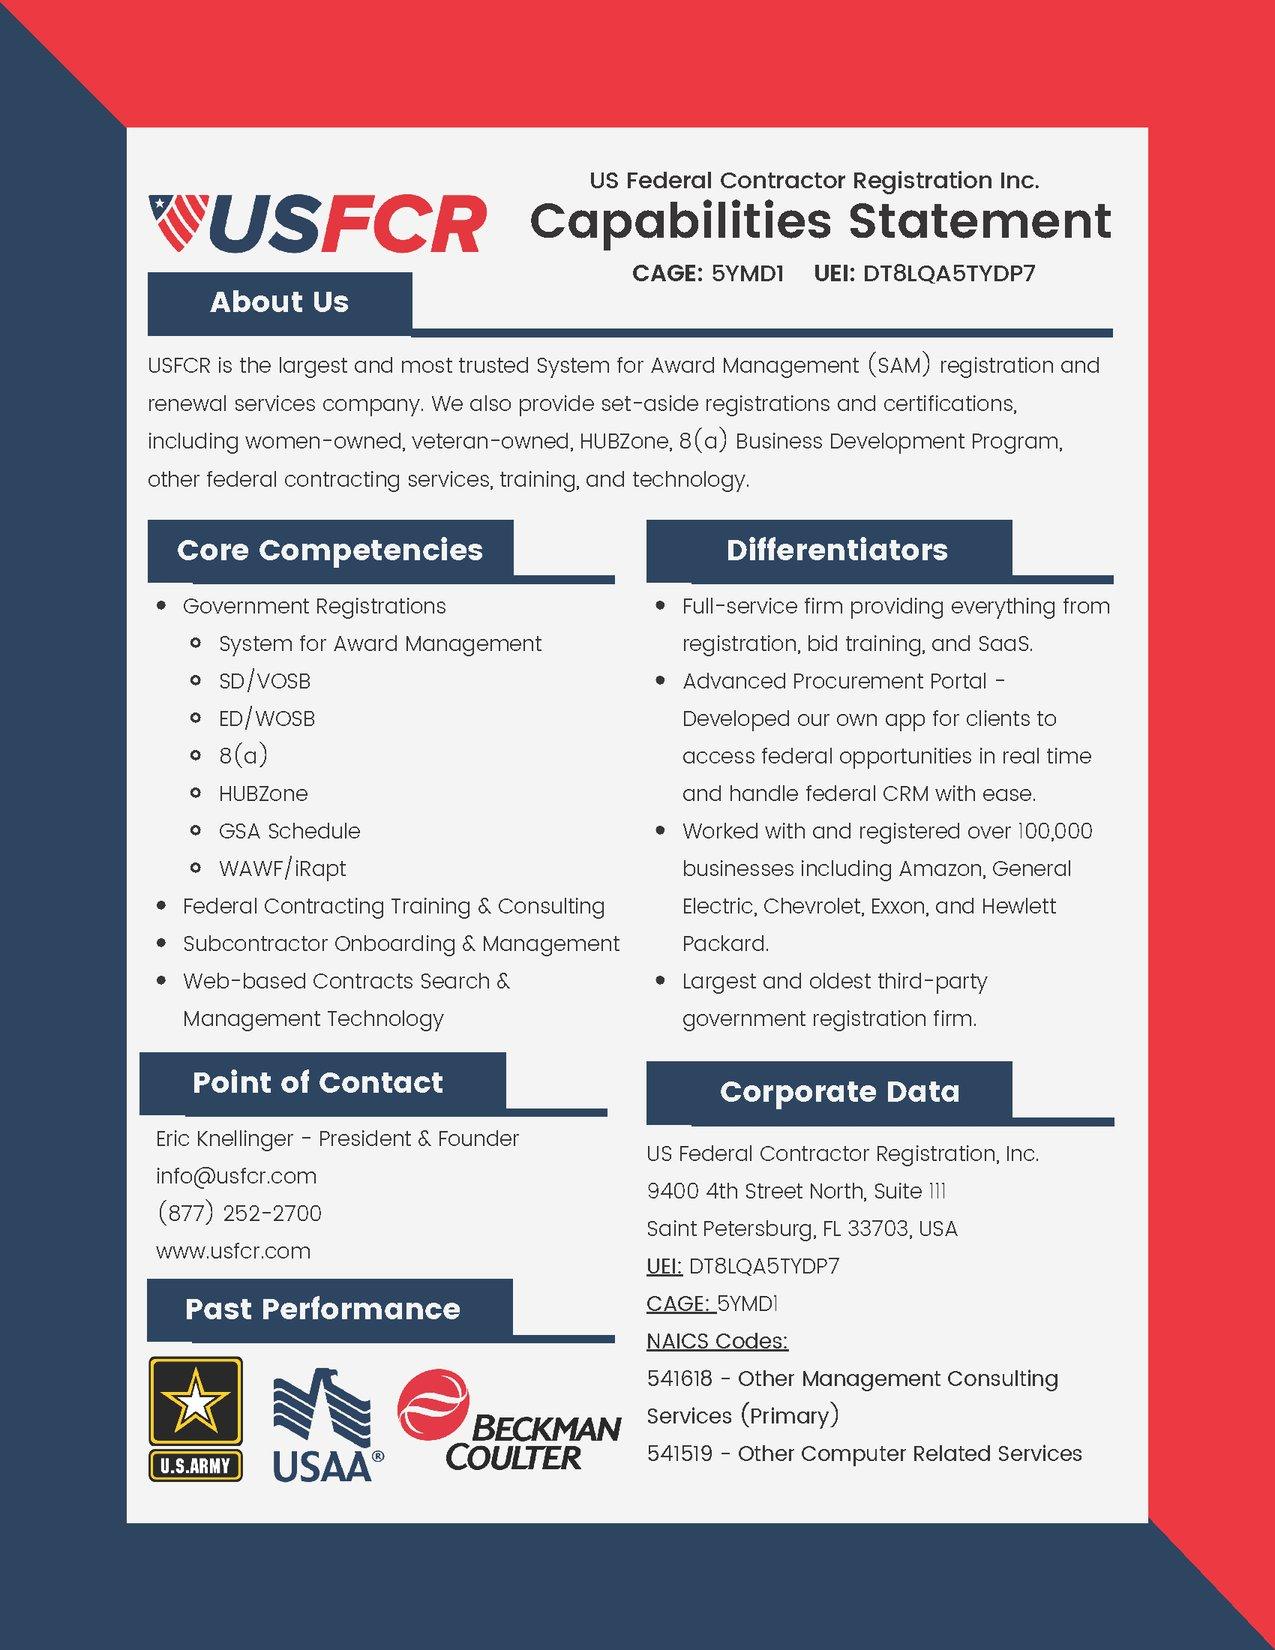 capabilities statemelnt